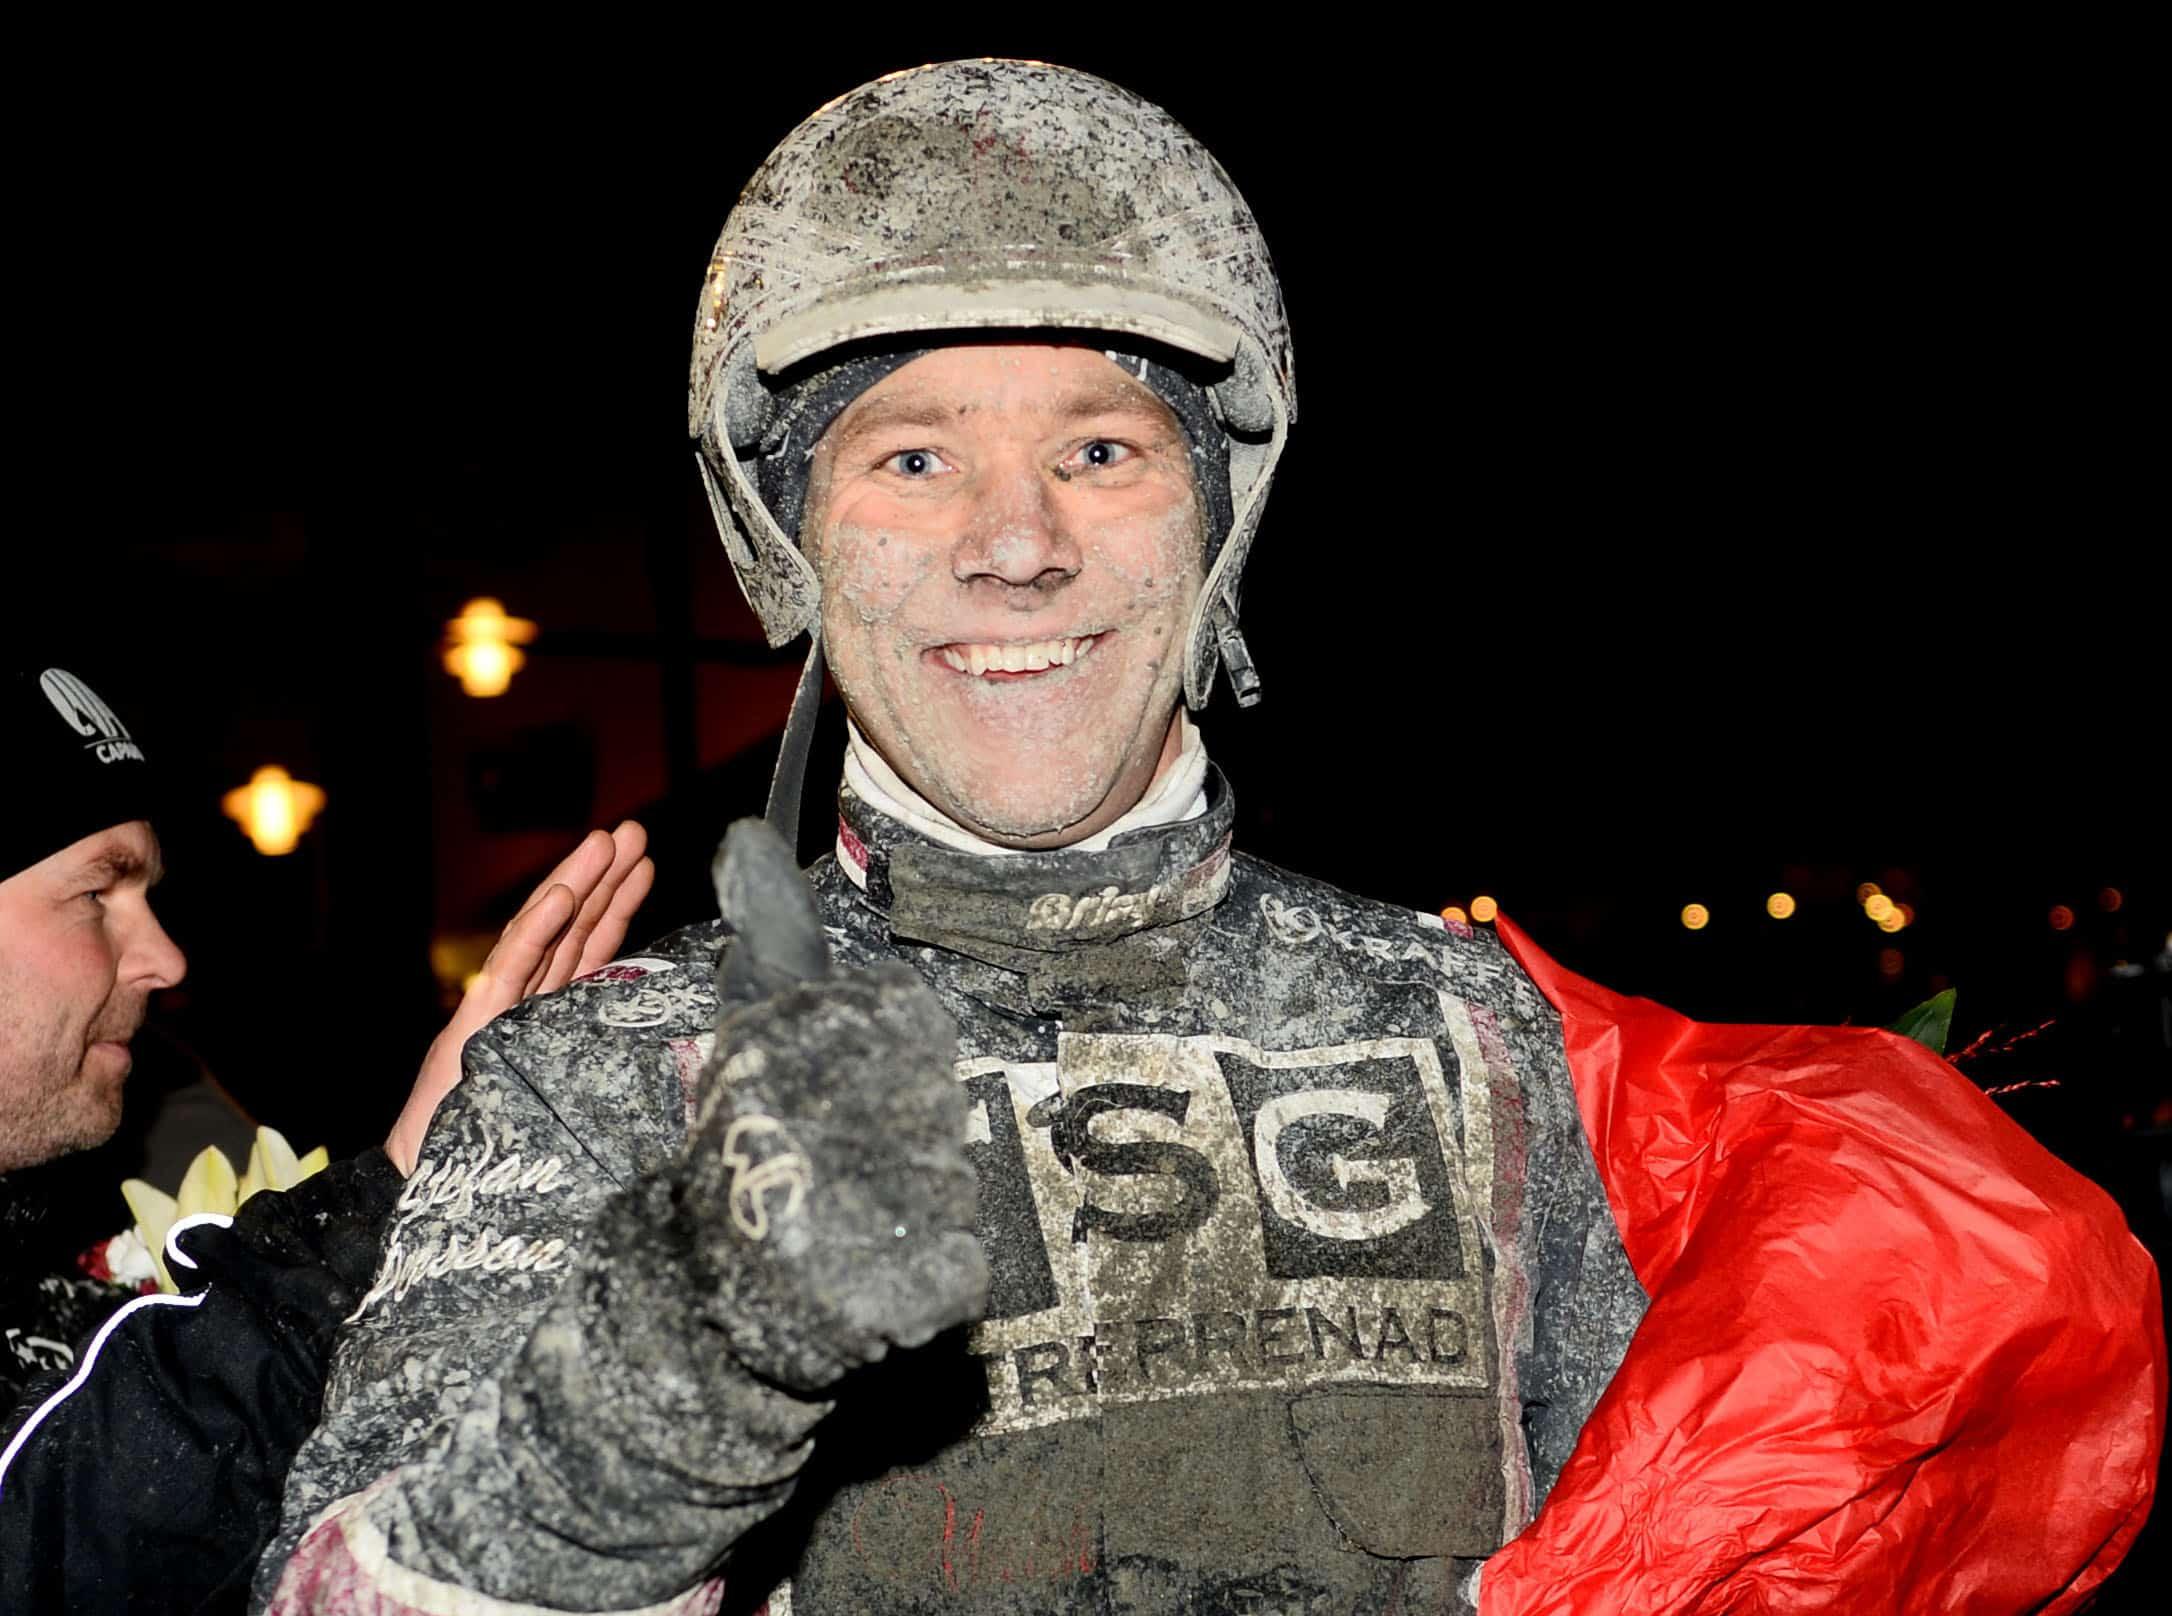 Wingait Erik är bästa chansen, säger Persson